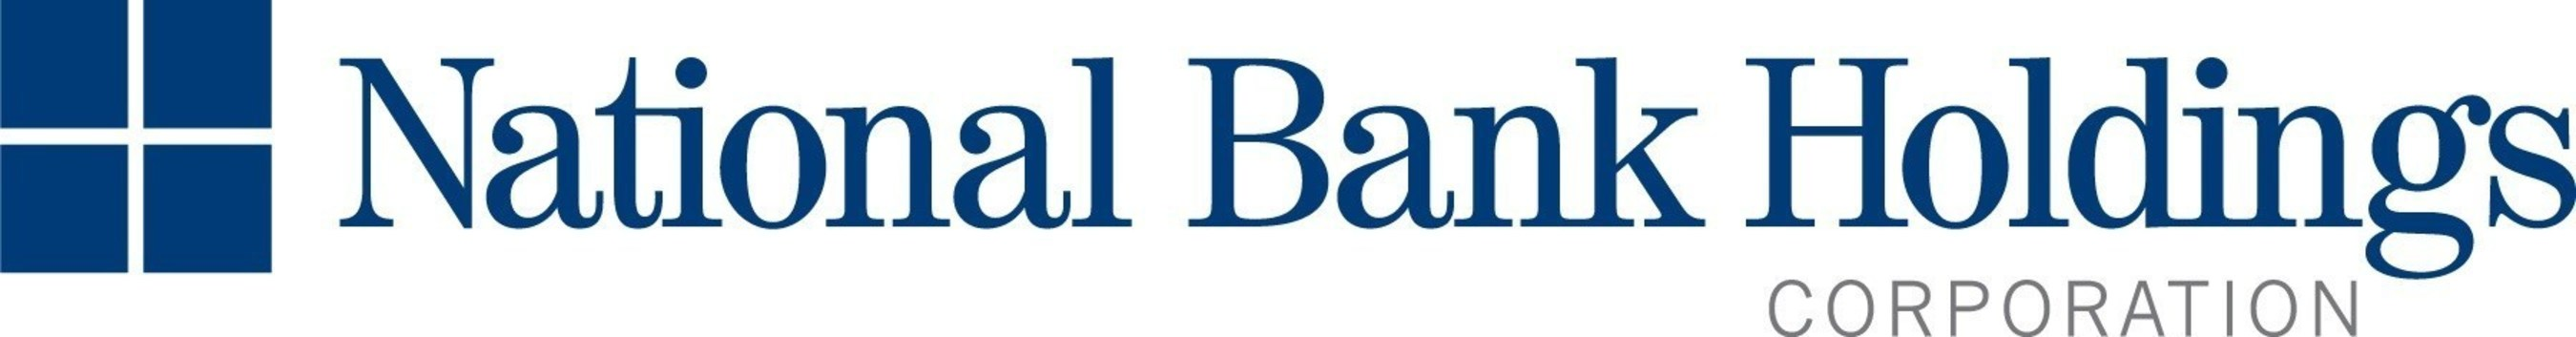 National Bank Holdings Corporation Logo. (PRNewsFoto/National Bank Holdings...)